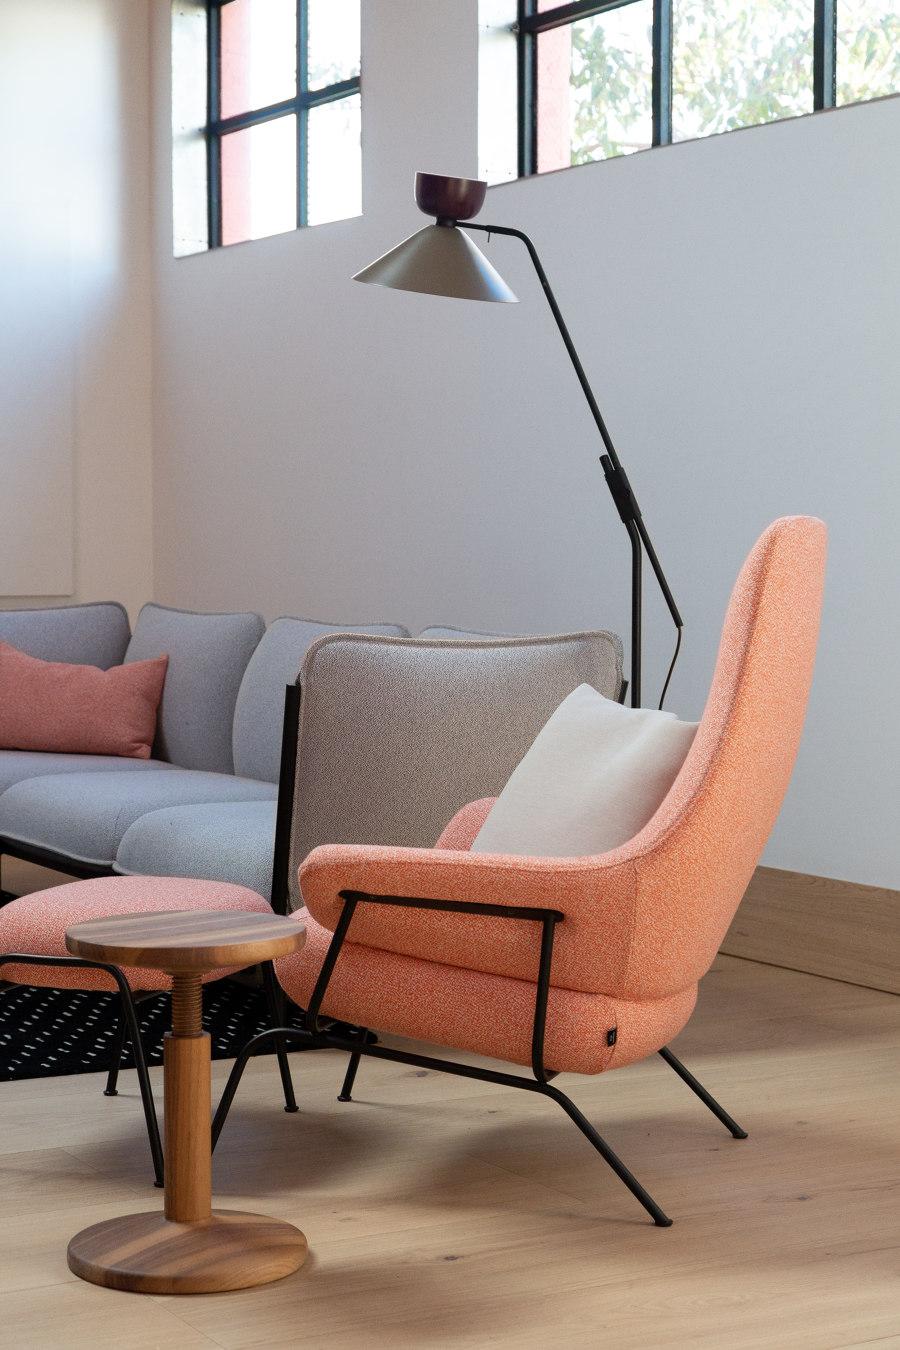 Hem's First US Showroom by Hem Design Studio | Office facilities